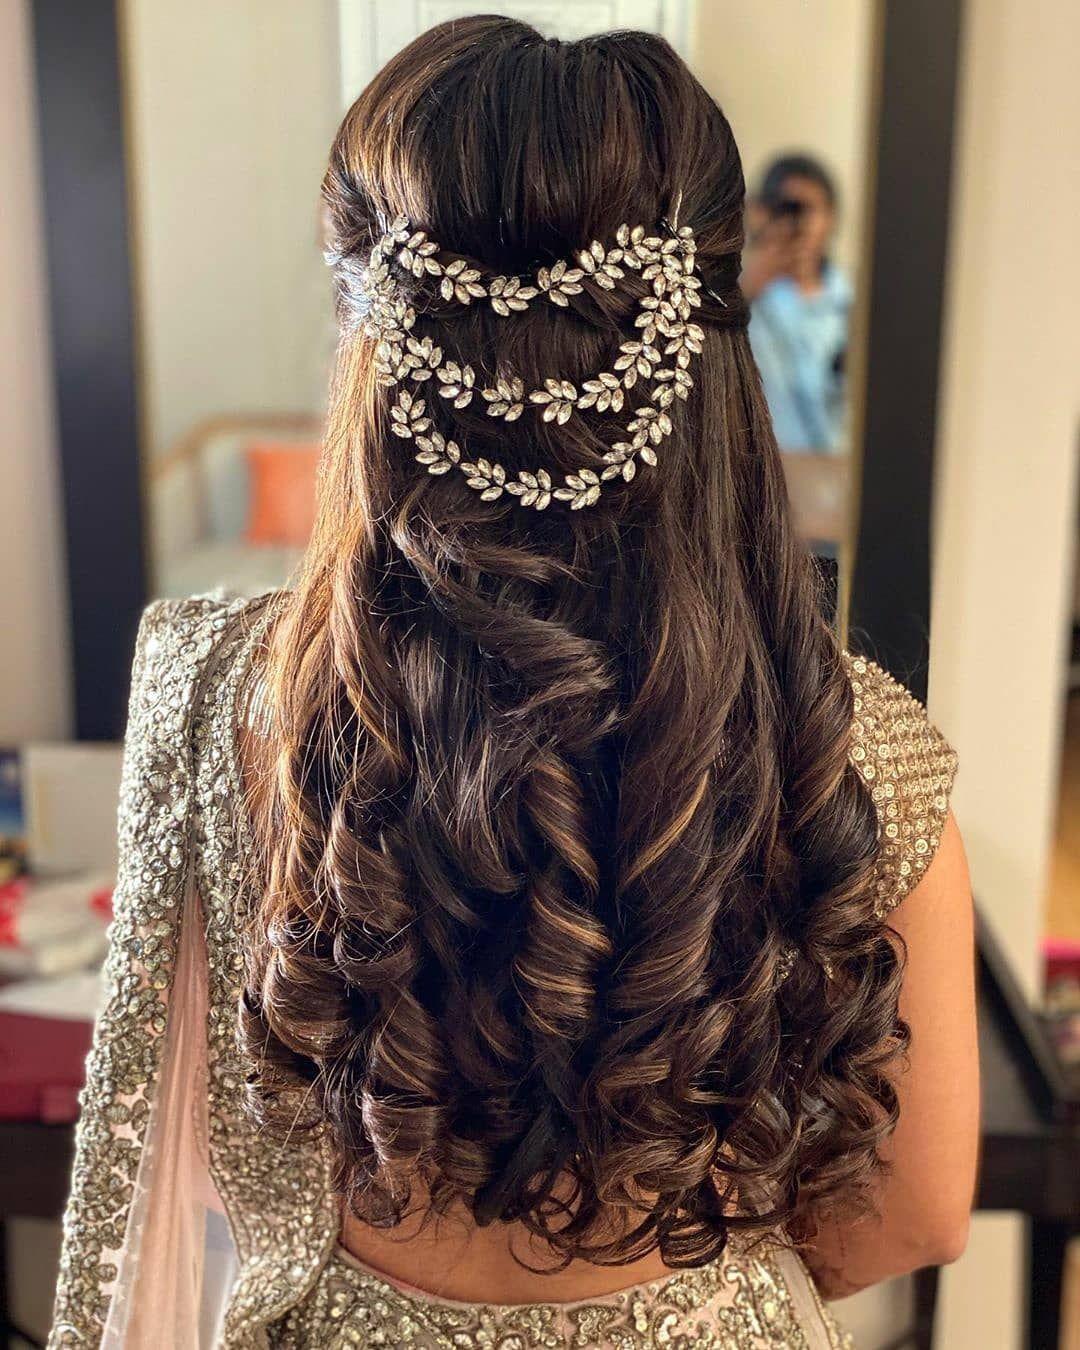 Pre Wedding Hairstyle Ideas In 2020 Hair Styles Bridal Hairdo Wedding Hairstyles For Long Hair